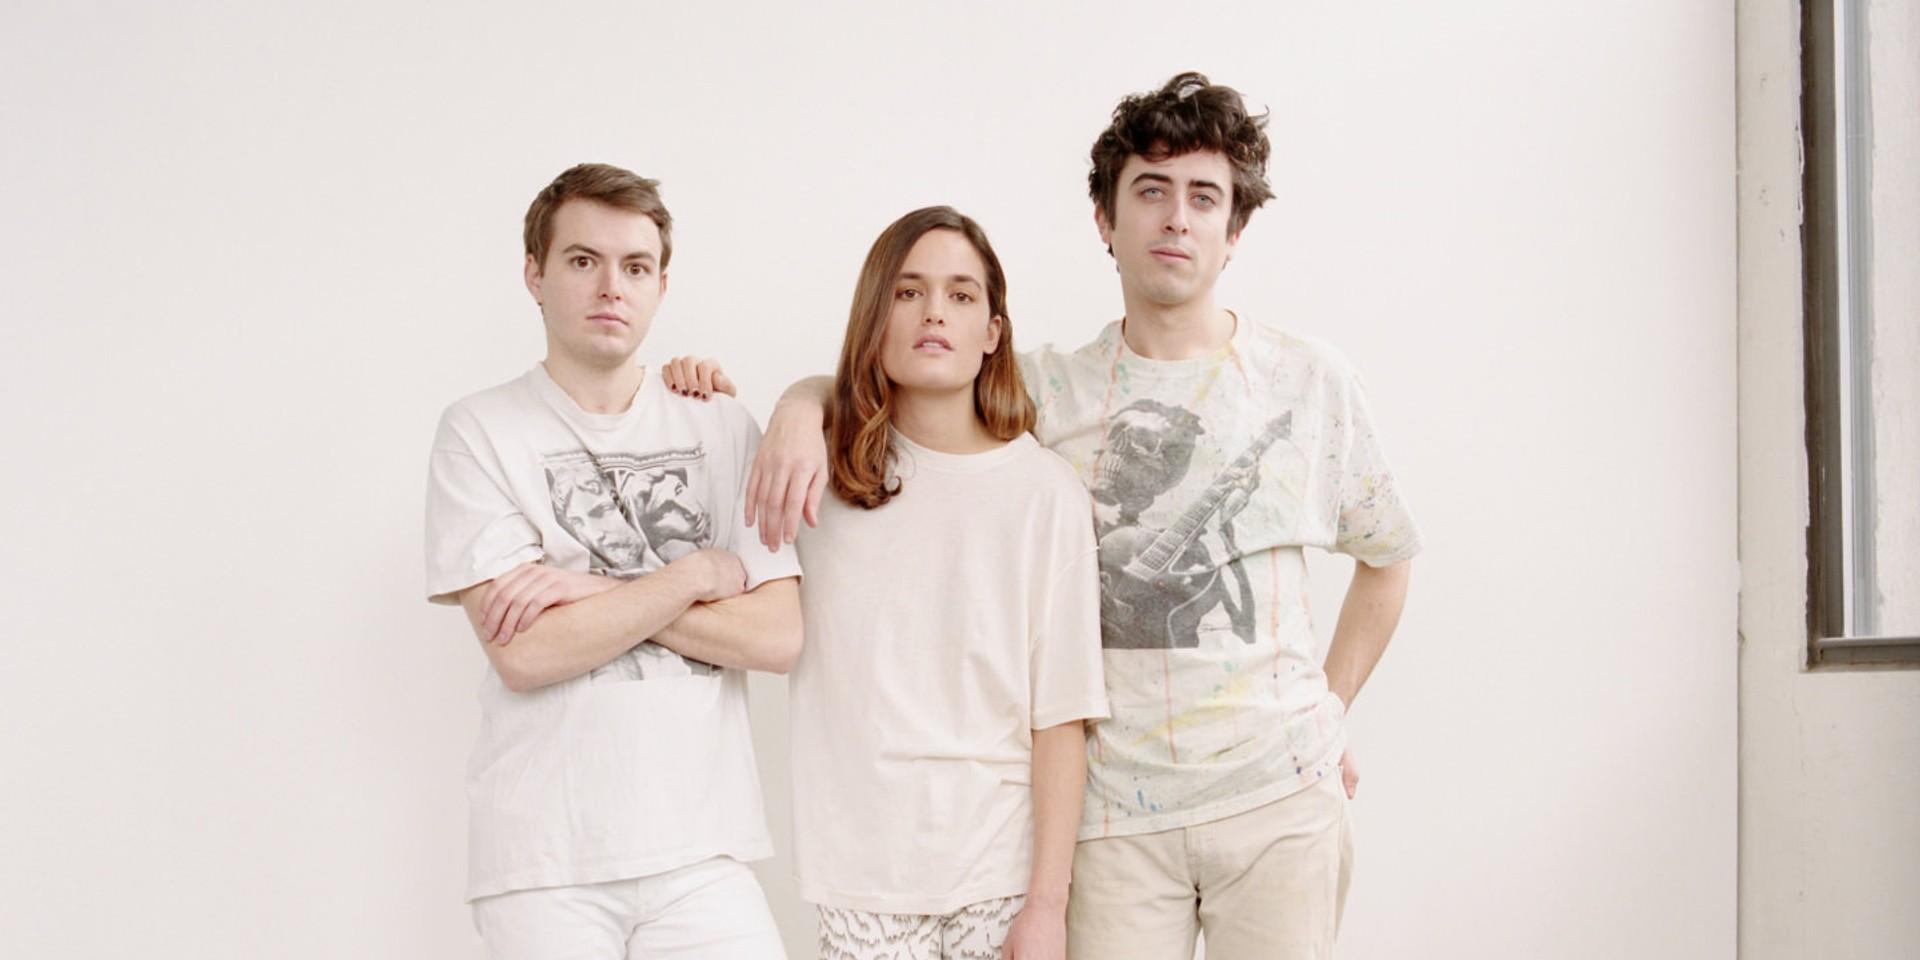 ALBUM REVIEW: Wet - Don't You